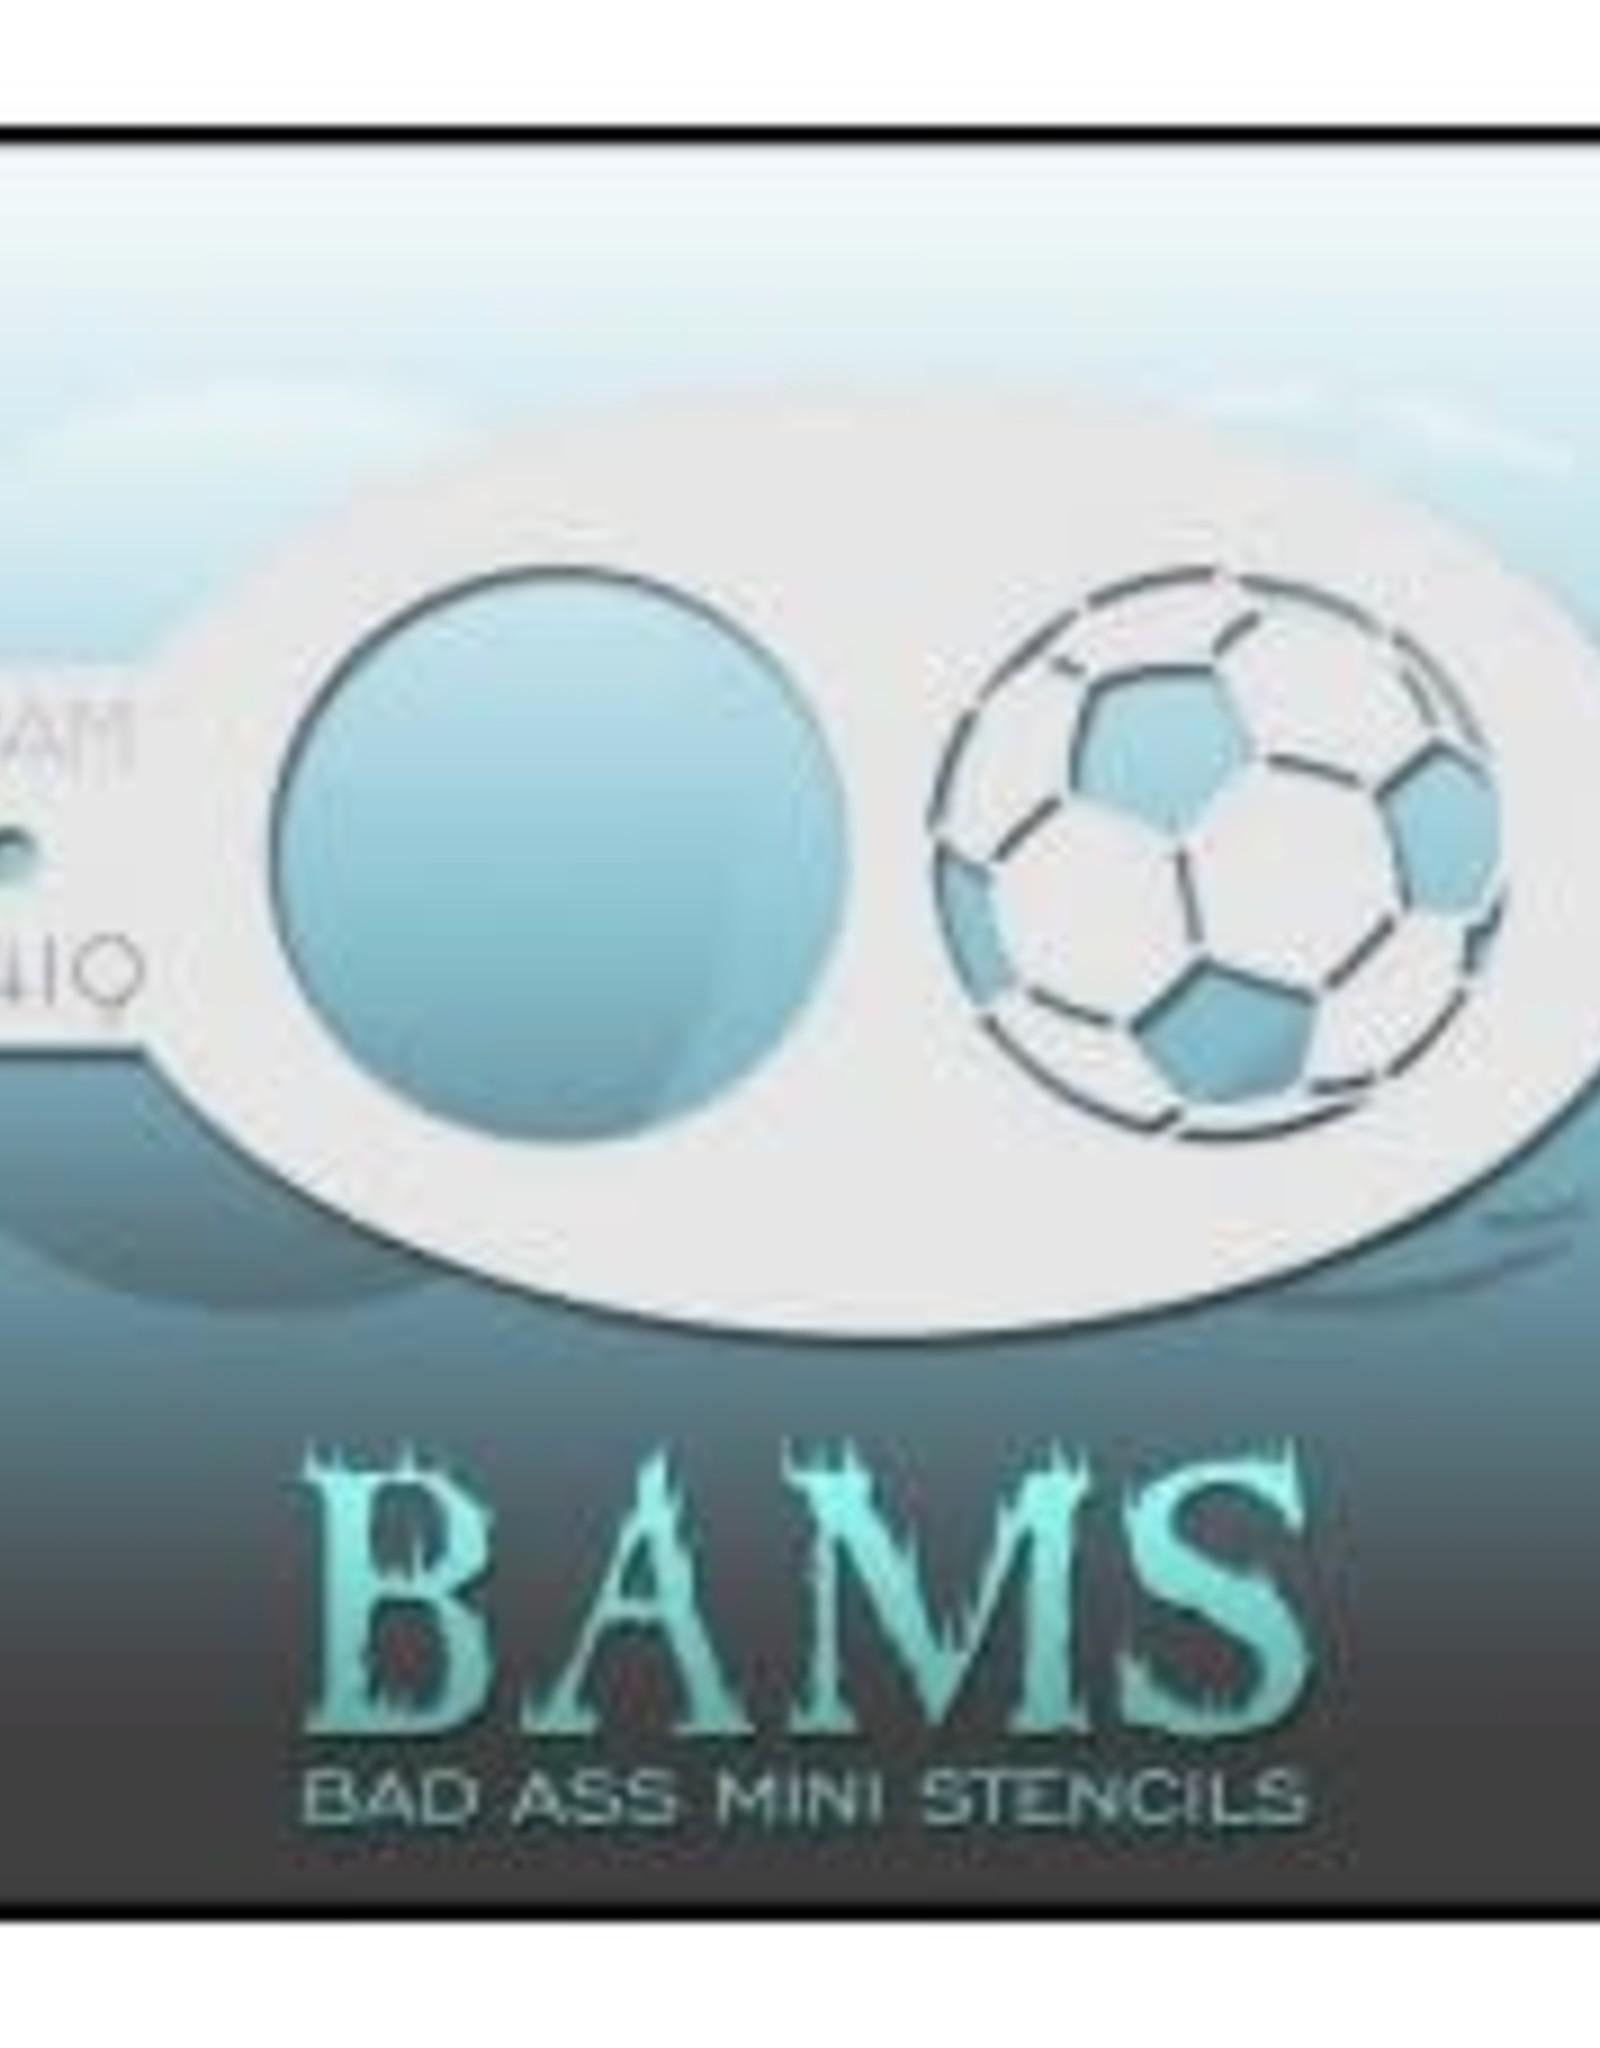 Bad Ass Stencils Bad Ass Mini Stencil - BAM1419